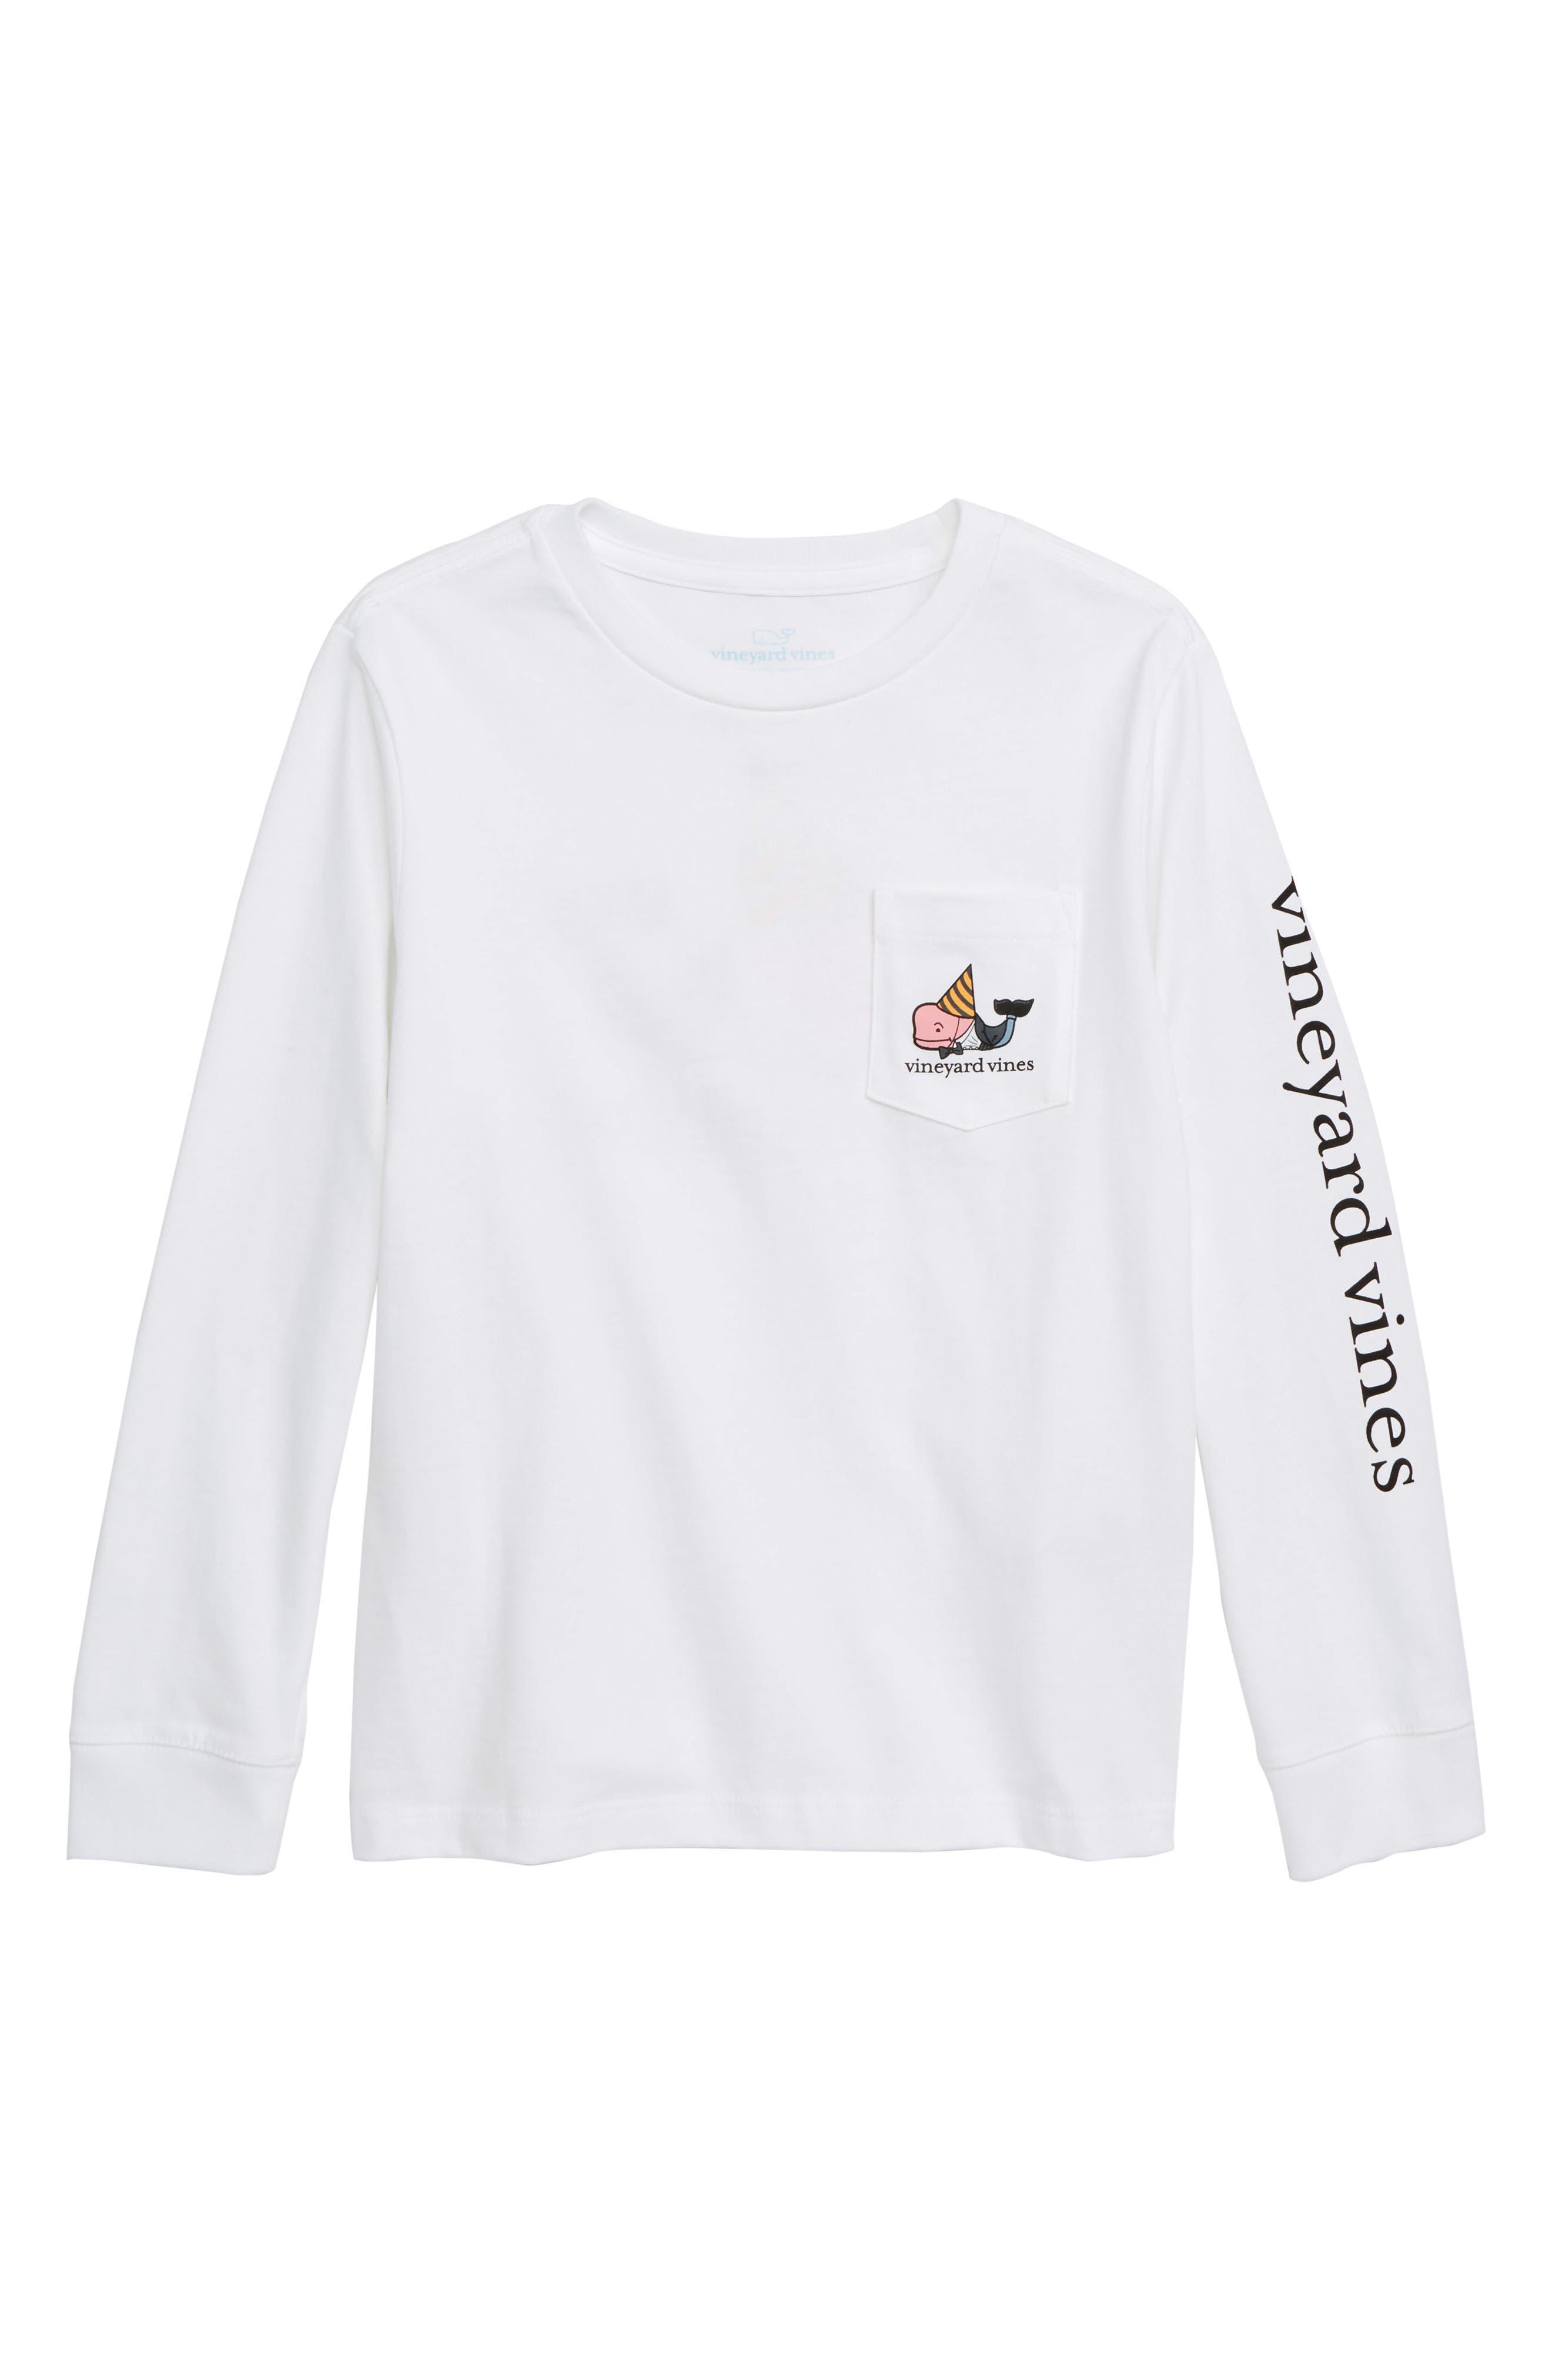 Dapper New Years Pocket T-Shirt,                         Main,                         color, WHITE CAP